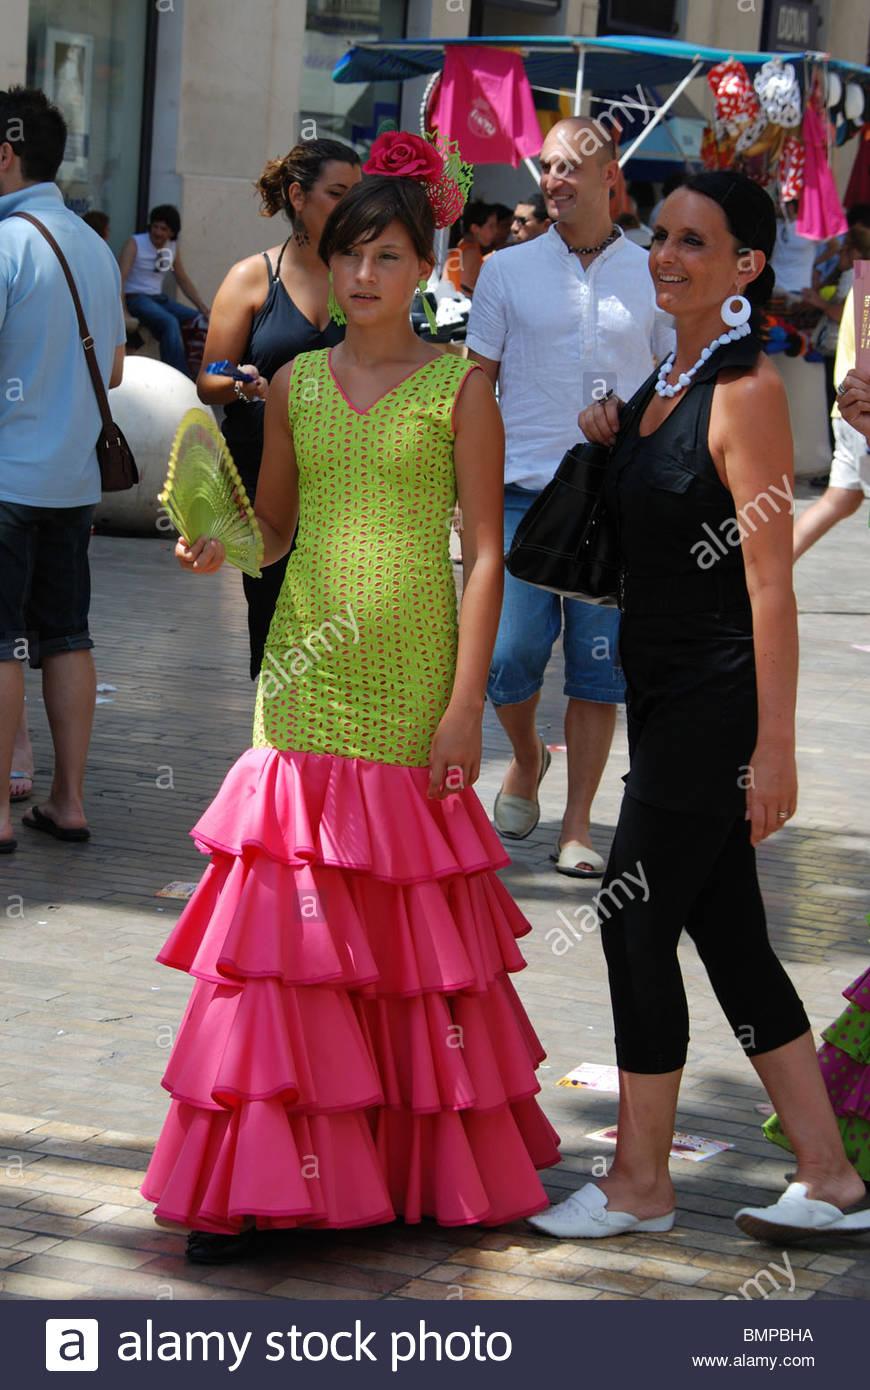 Malaga Feria Imágenes De Stock   Malaga Feria Fotos De Stock - Alamy 3e5e9f2bf3f